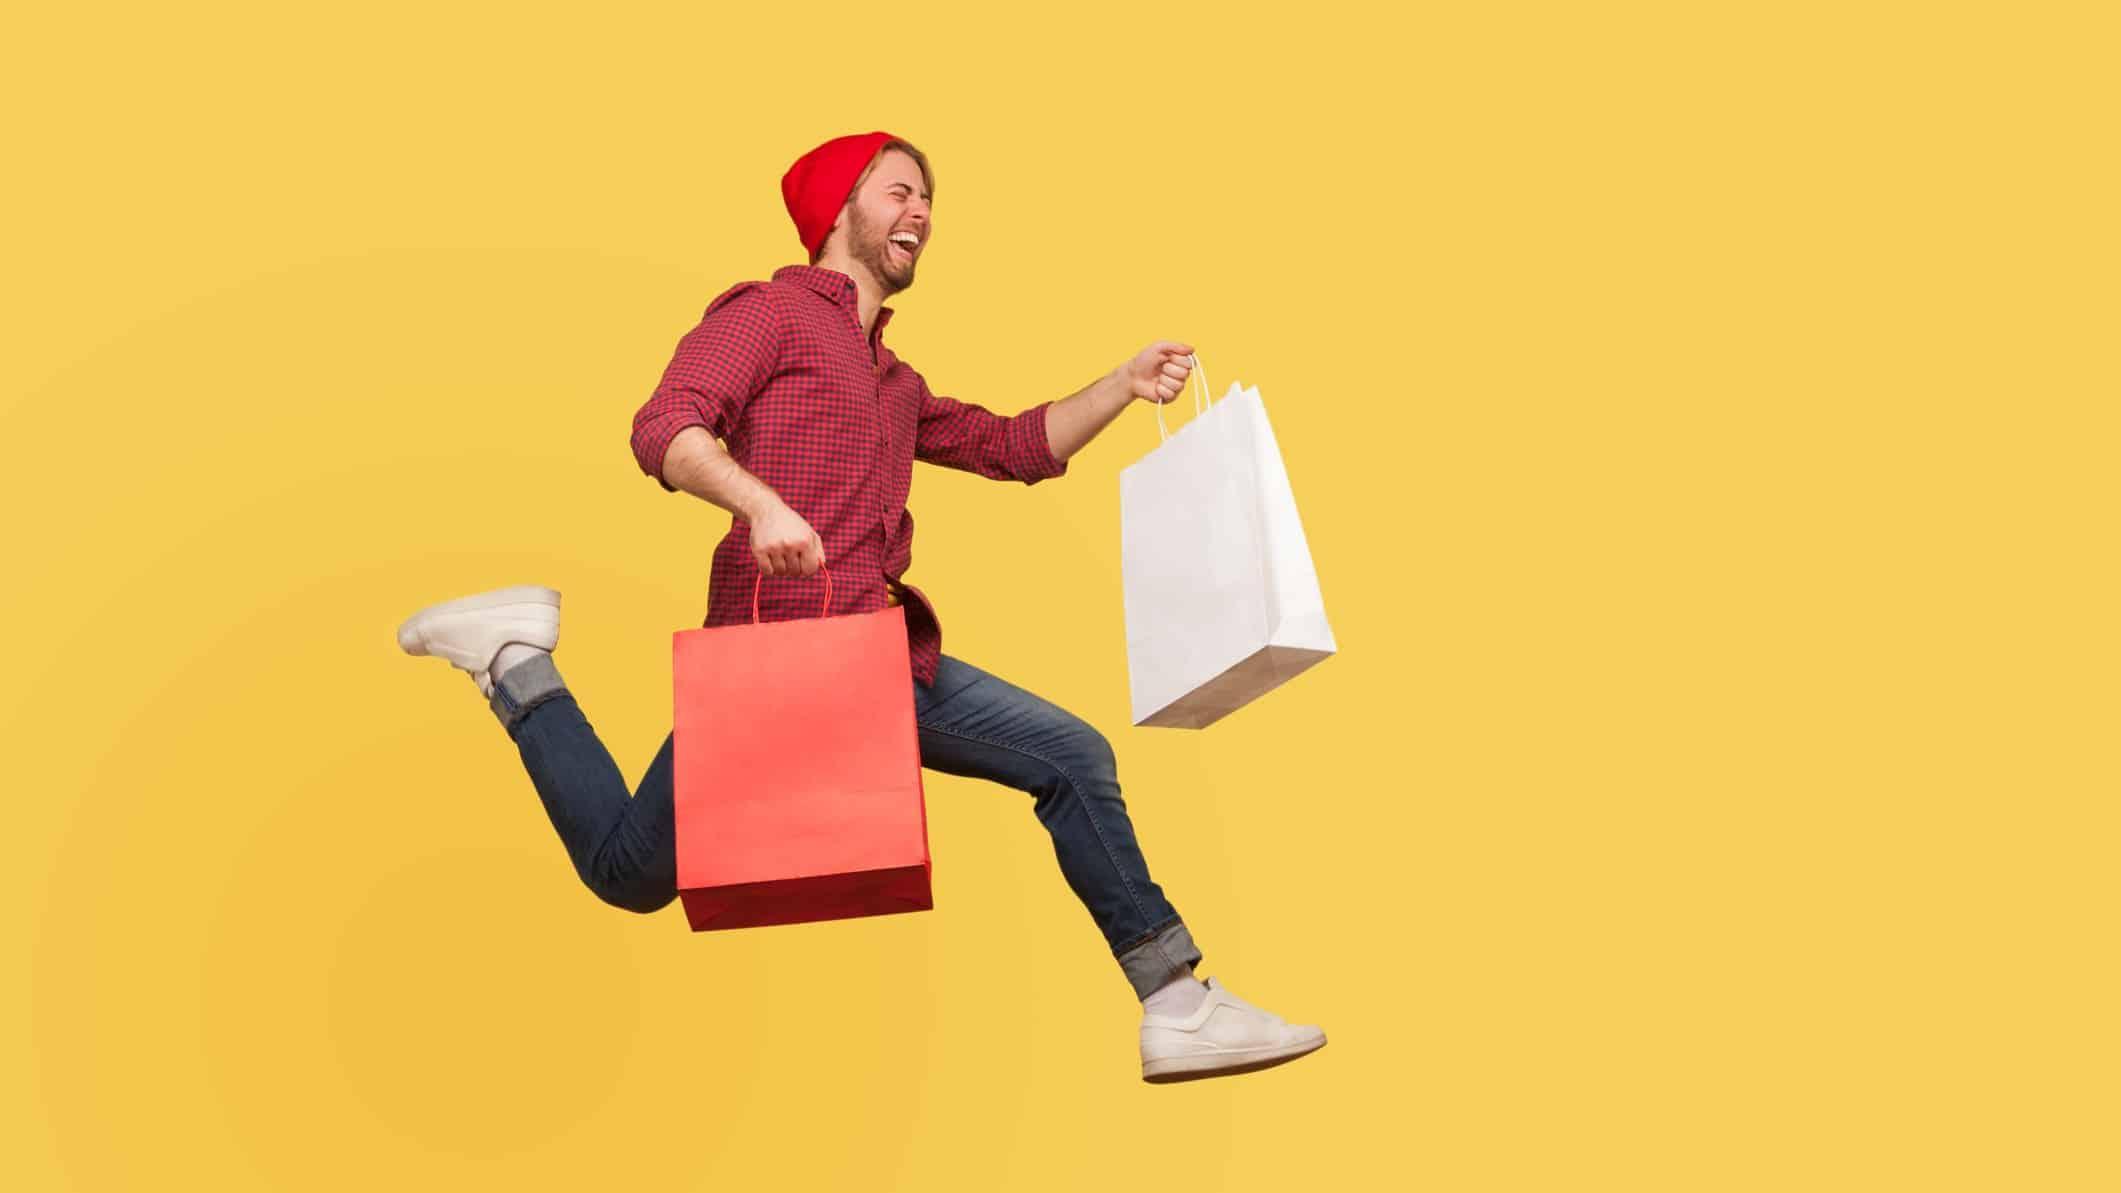 man jumping for joy carrying shopping bags